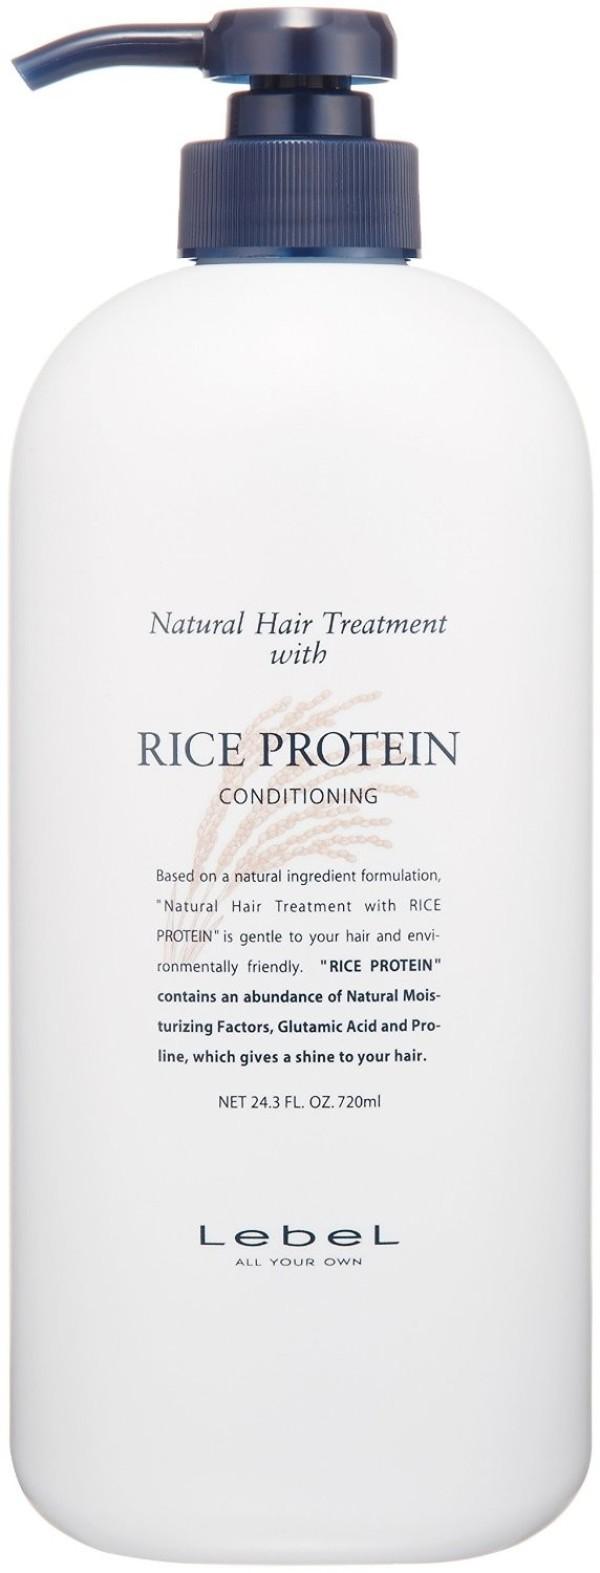 LEBEL Natural Hair Treatment RP (Rice Protein) 720ml